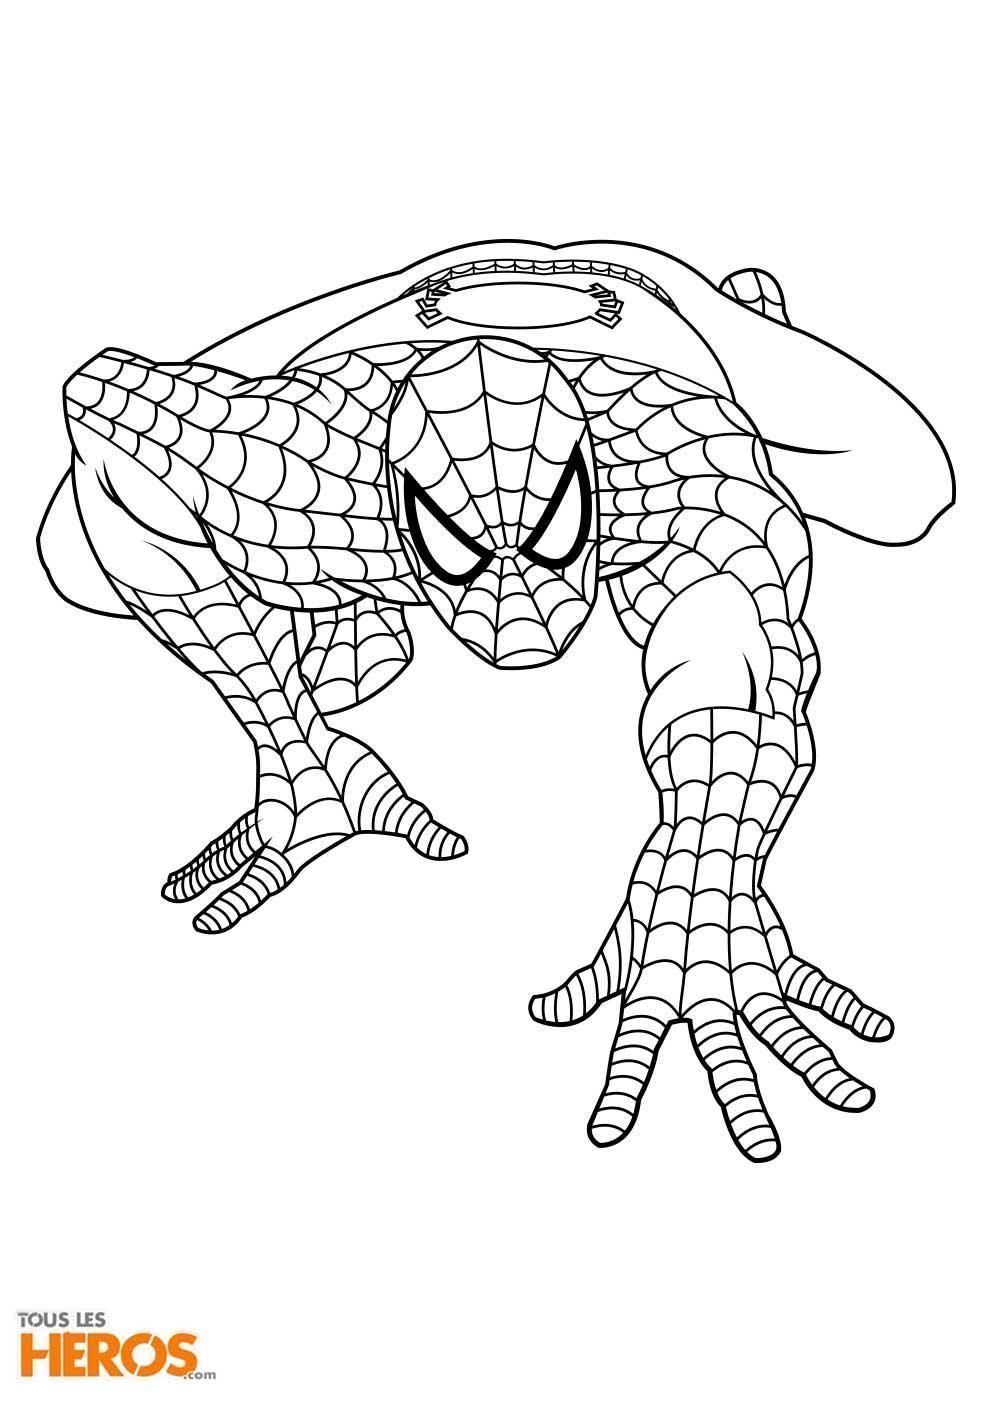 42 Coloriage A Imprimer Spiderman Superhero Coloring Pages Spiderman Coloring Superhero Coloring